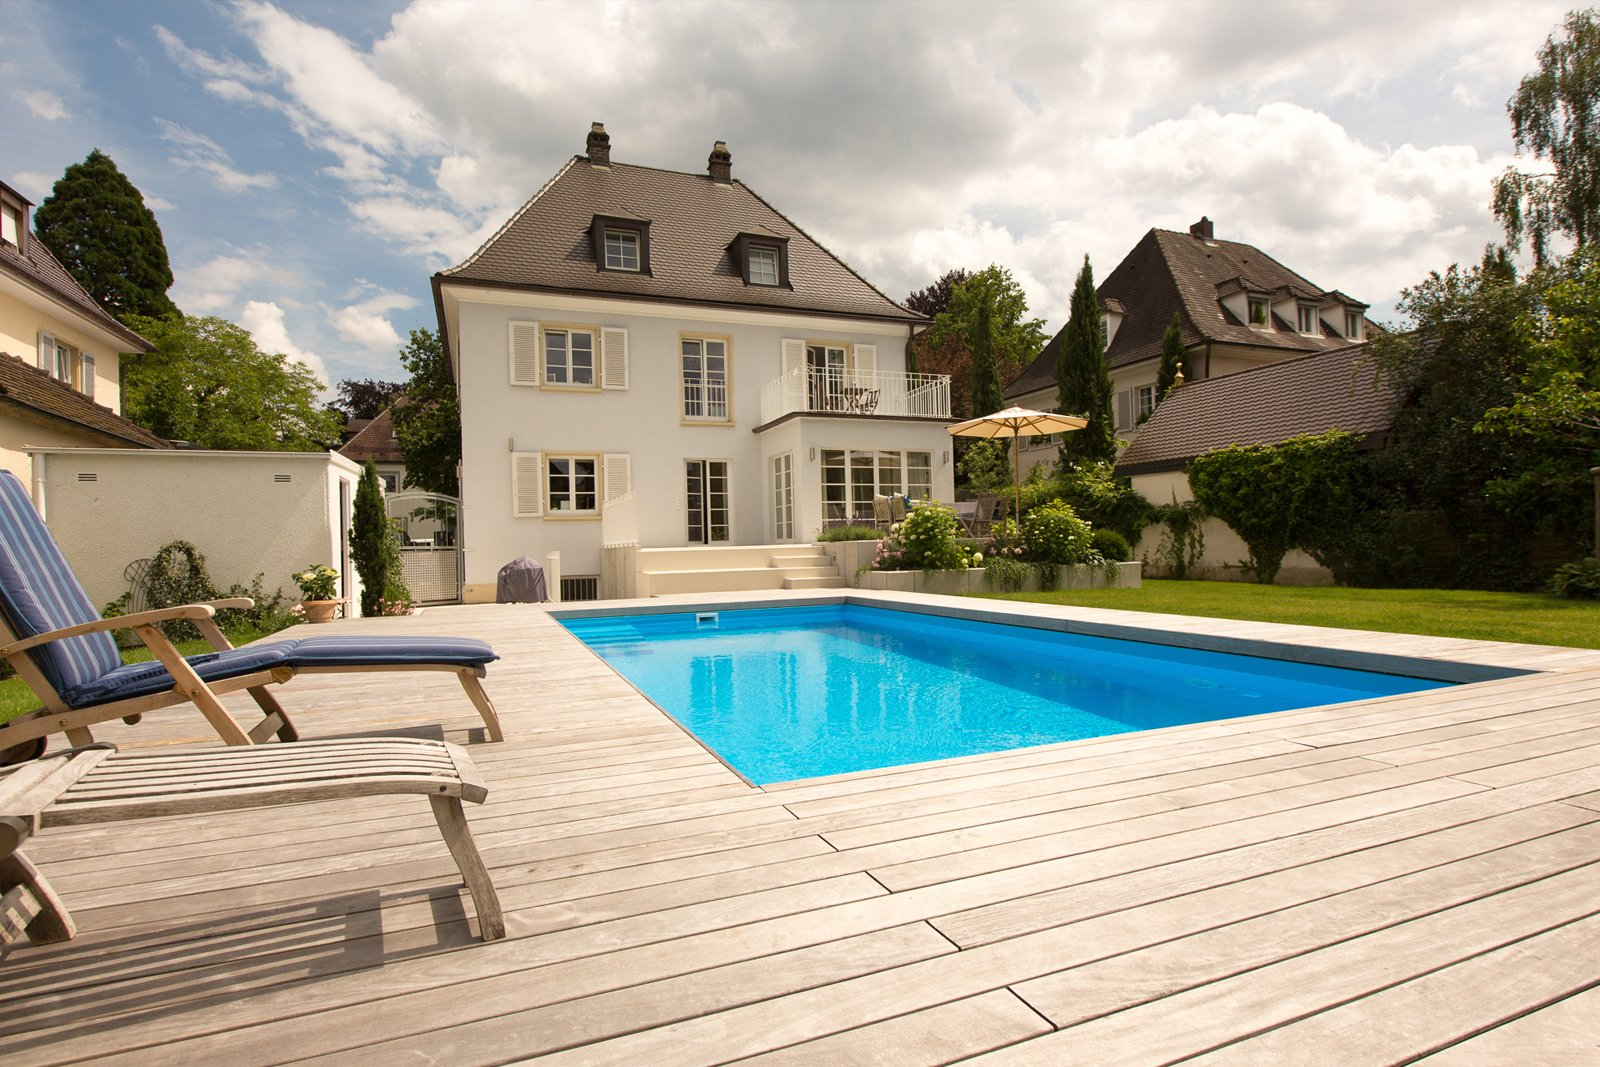 Holzterrasse mit Swimmingpool